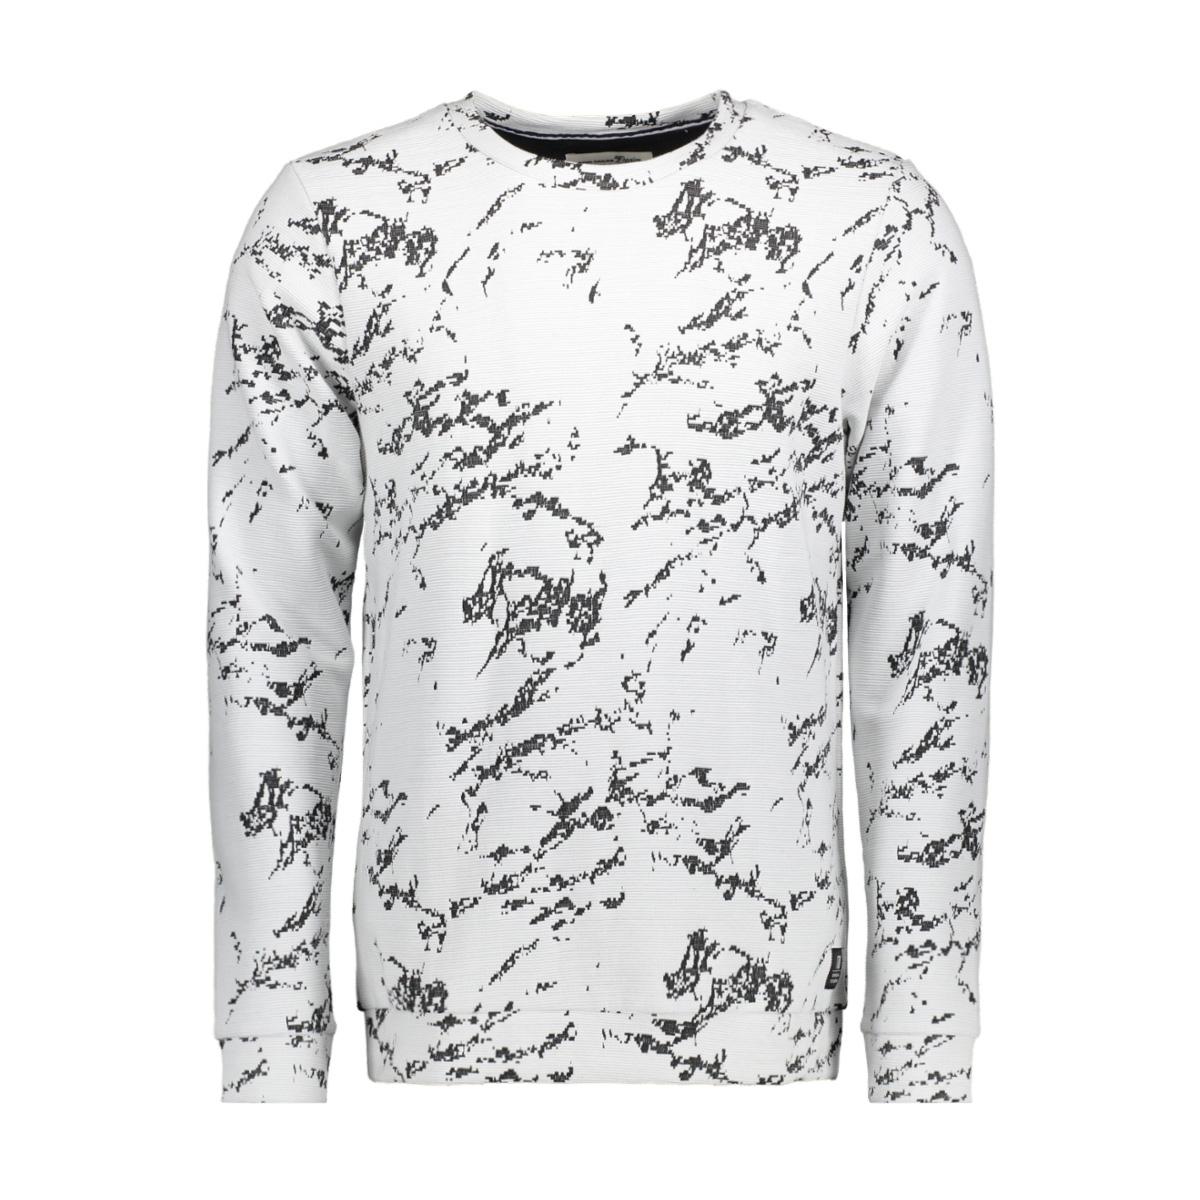 2555130.00.12 tom tailor sweater 2000